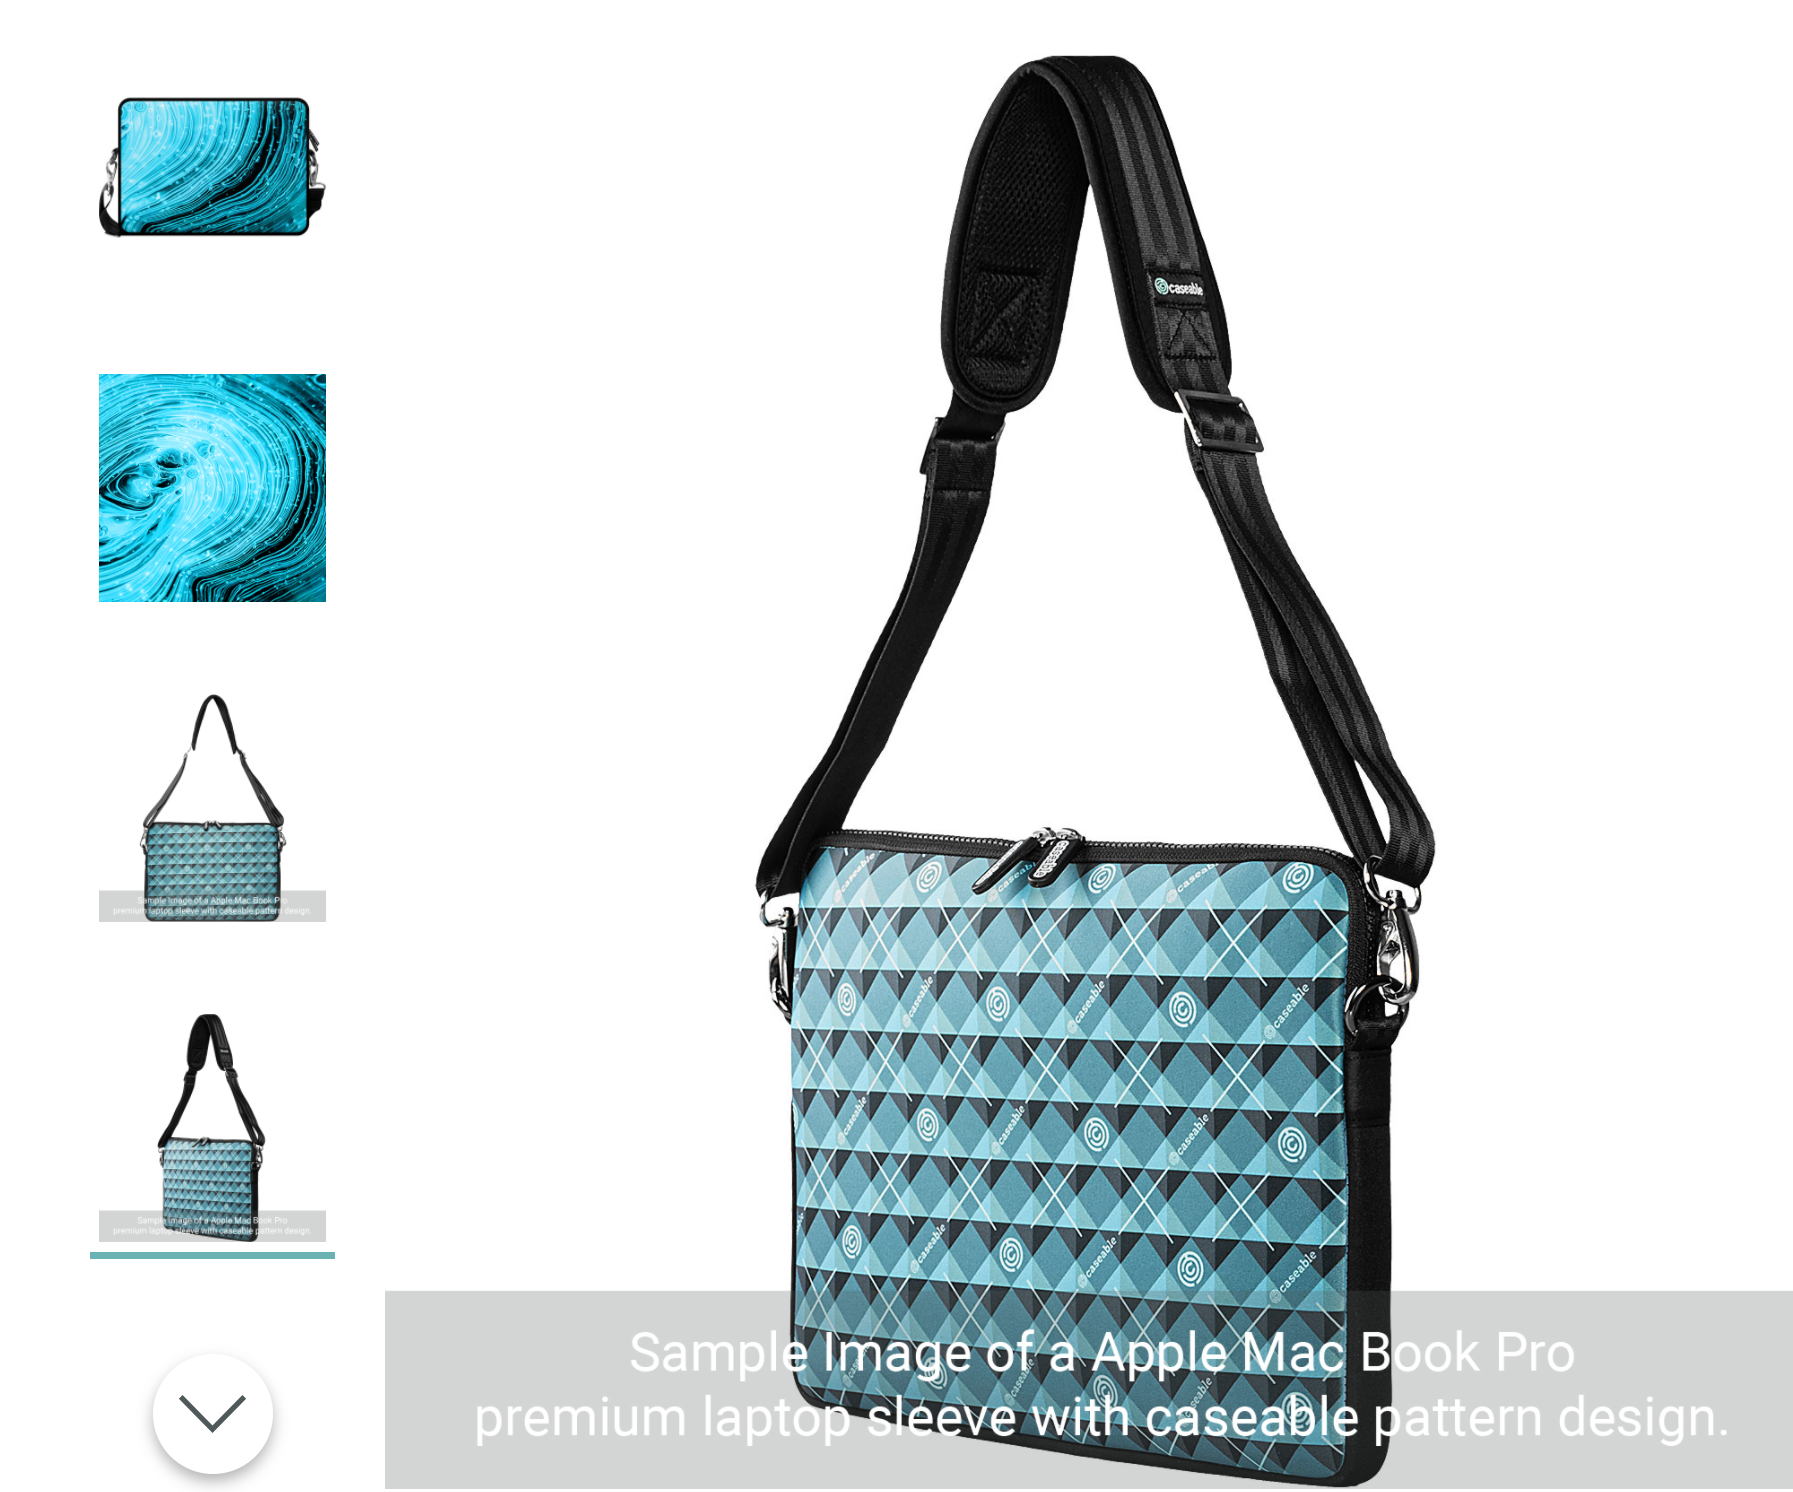 Premium Laptop Sleeve for Apple MacBook Pro 13 (2020) @Caseable